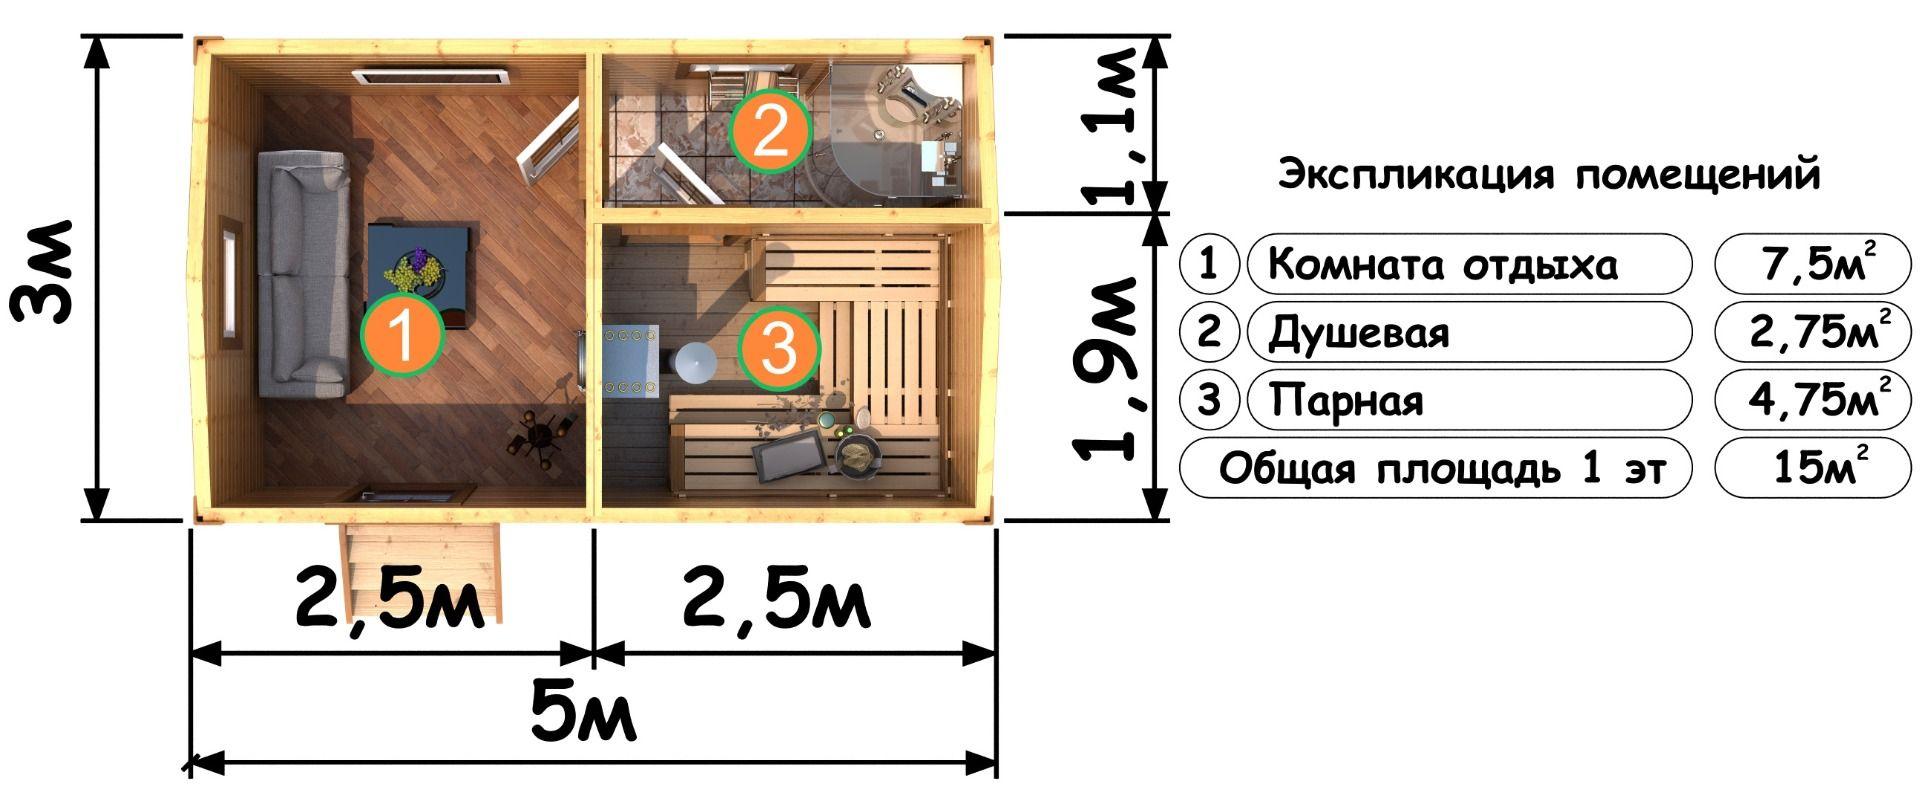 Планировка бани размером 3х5 м